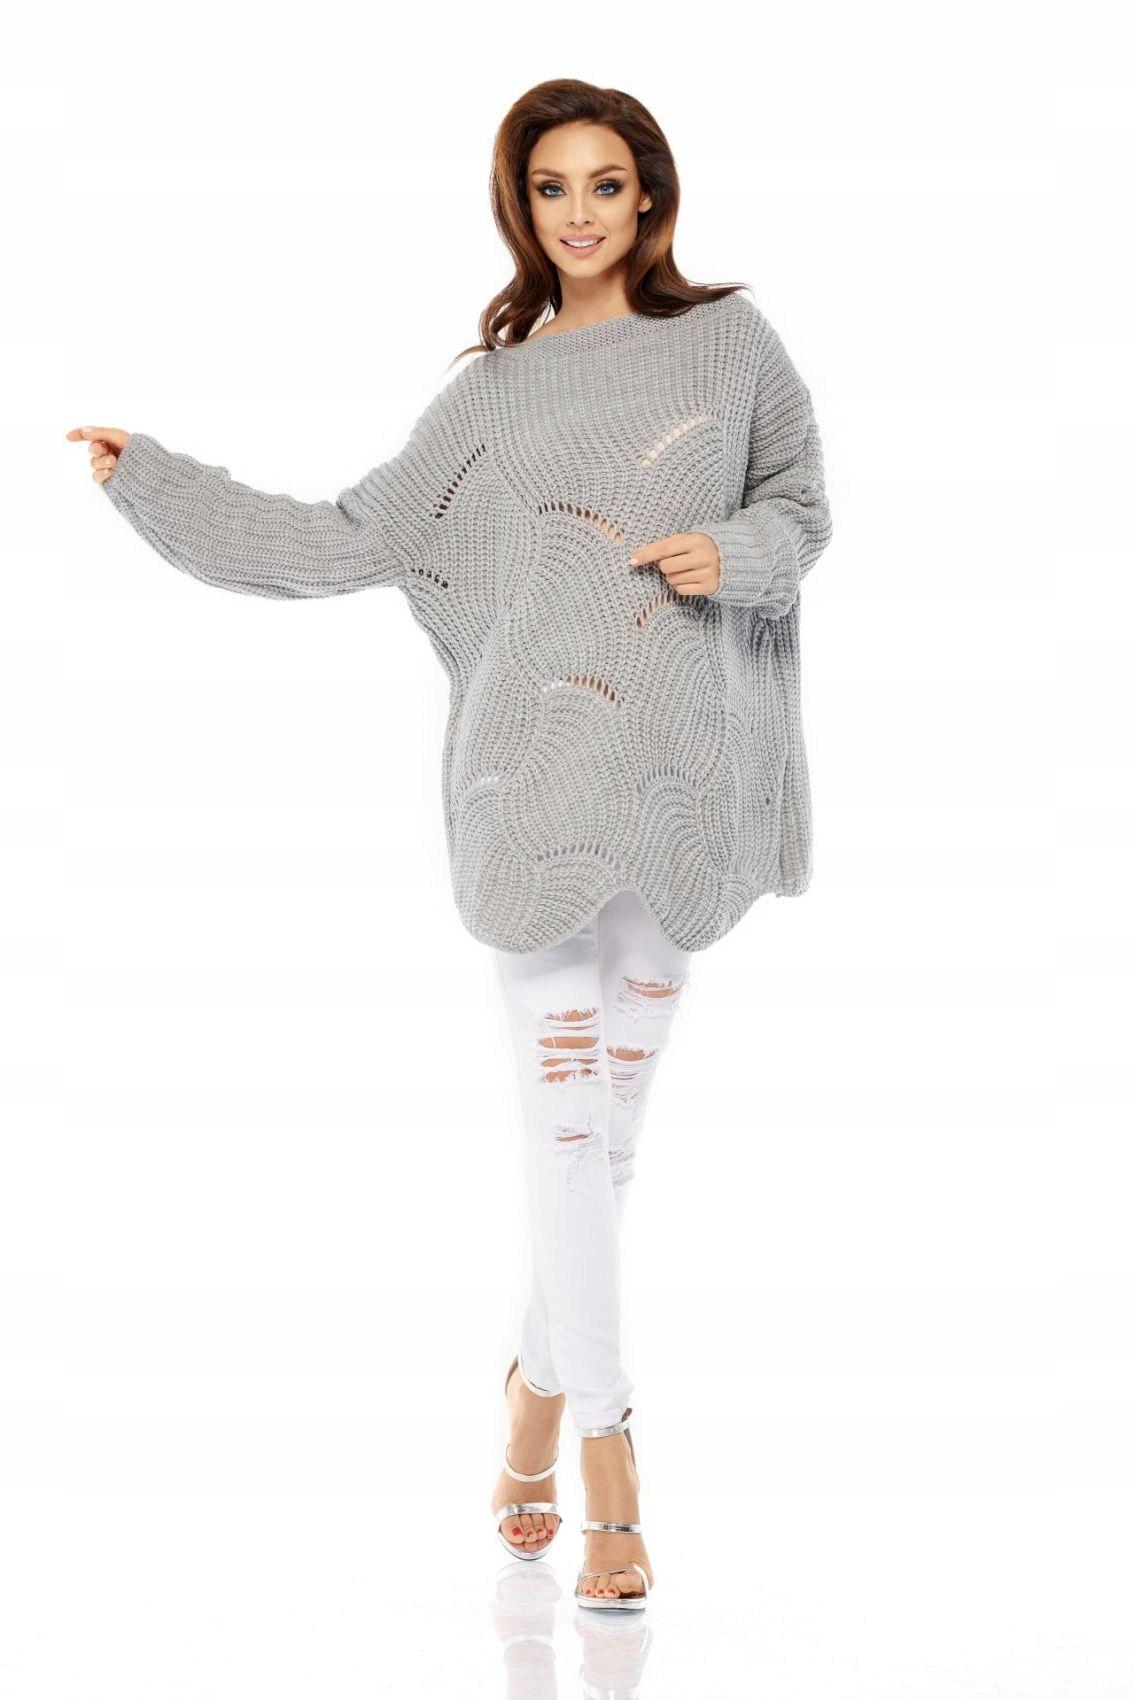 LS209 Luźny sweter oversize jasnoszary S/l